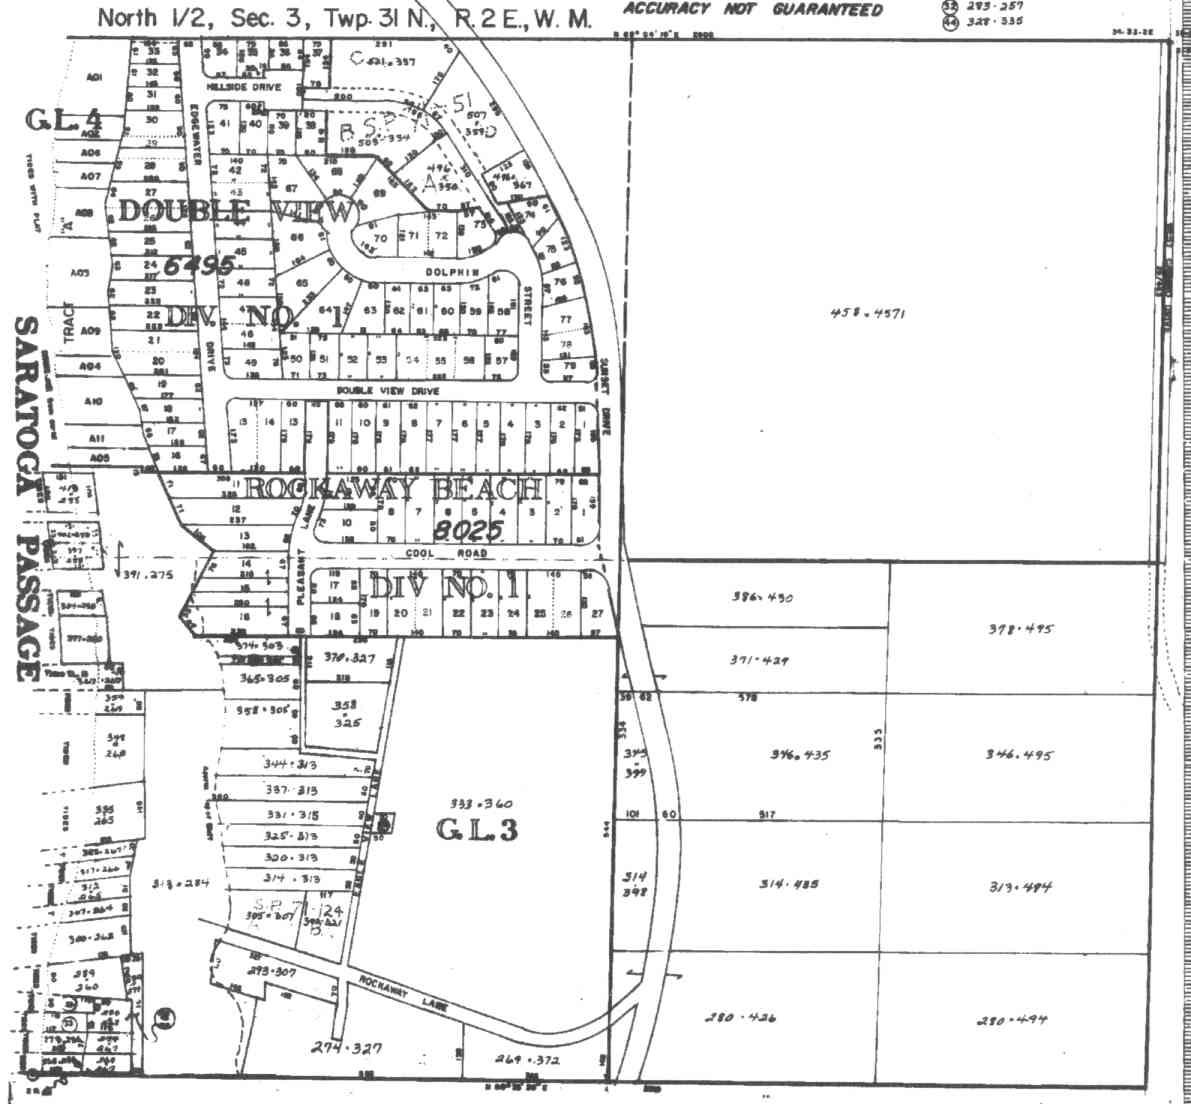 Camano Rockaway Beach area, large survey maps, wells, and